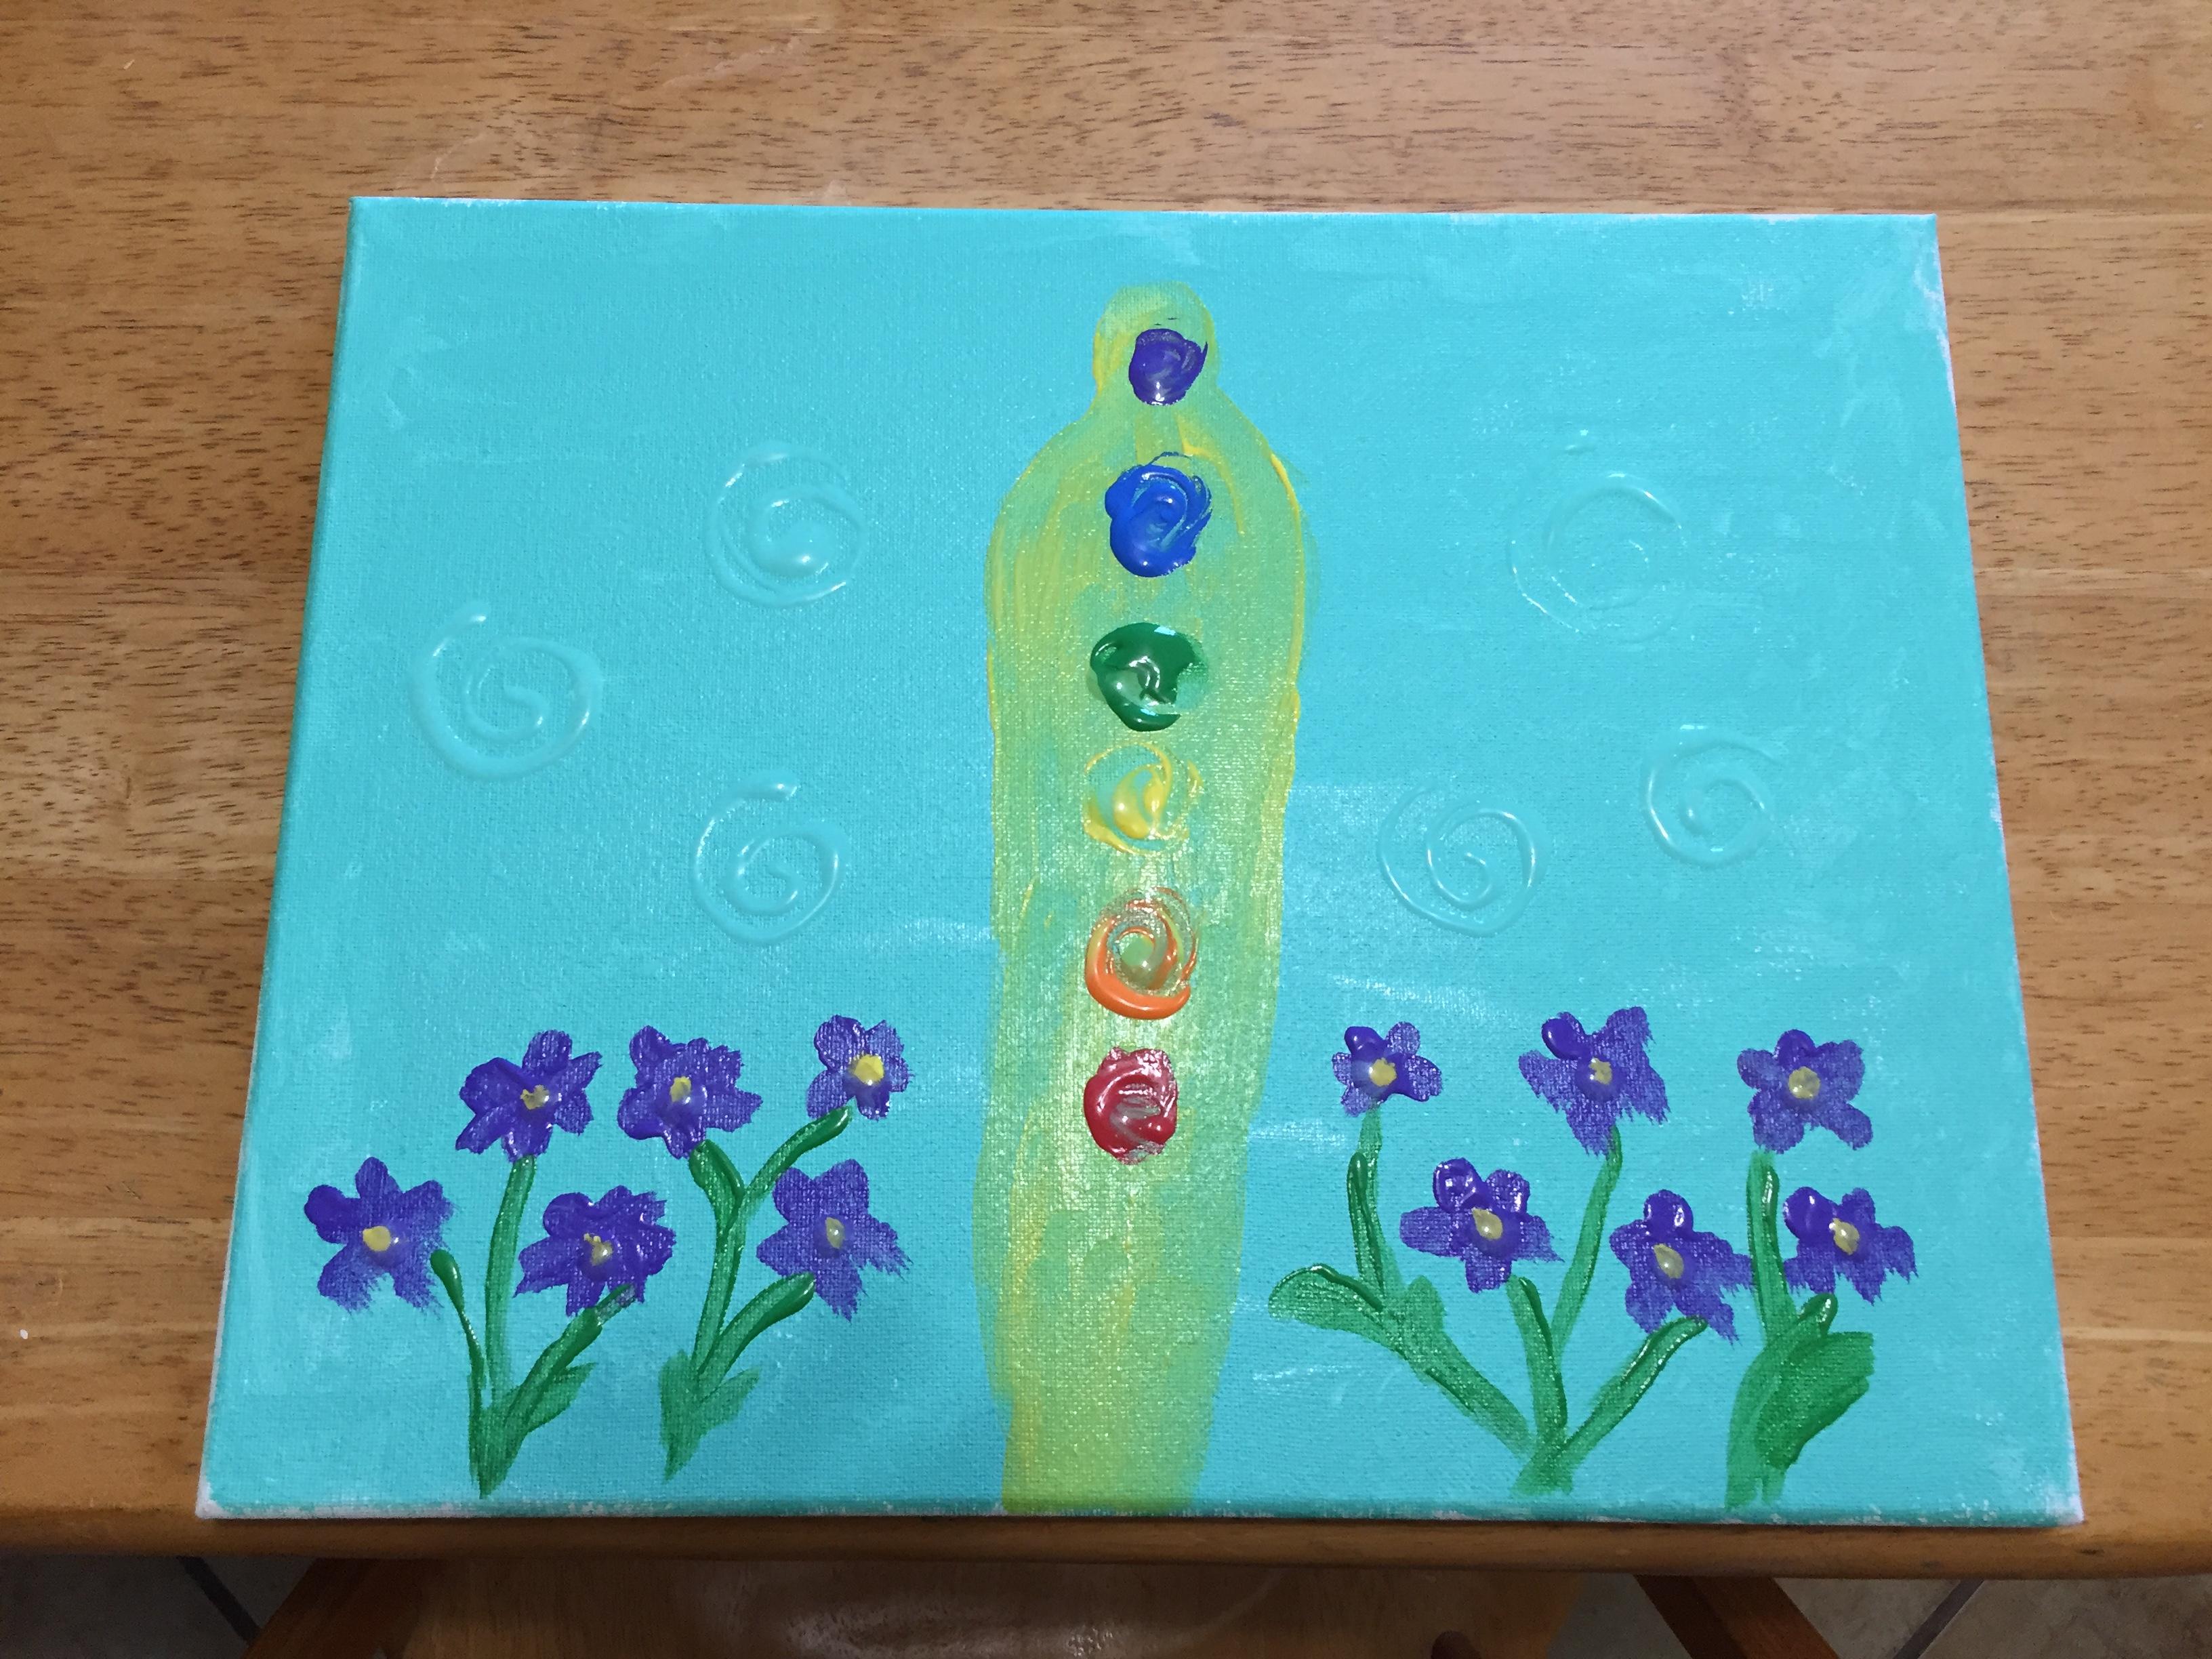 IMG_0009 30 April 2020 Jackie Wygant painting Alvarado TX